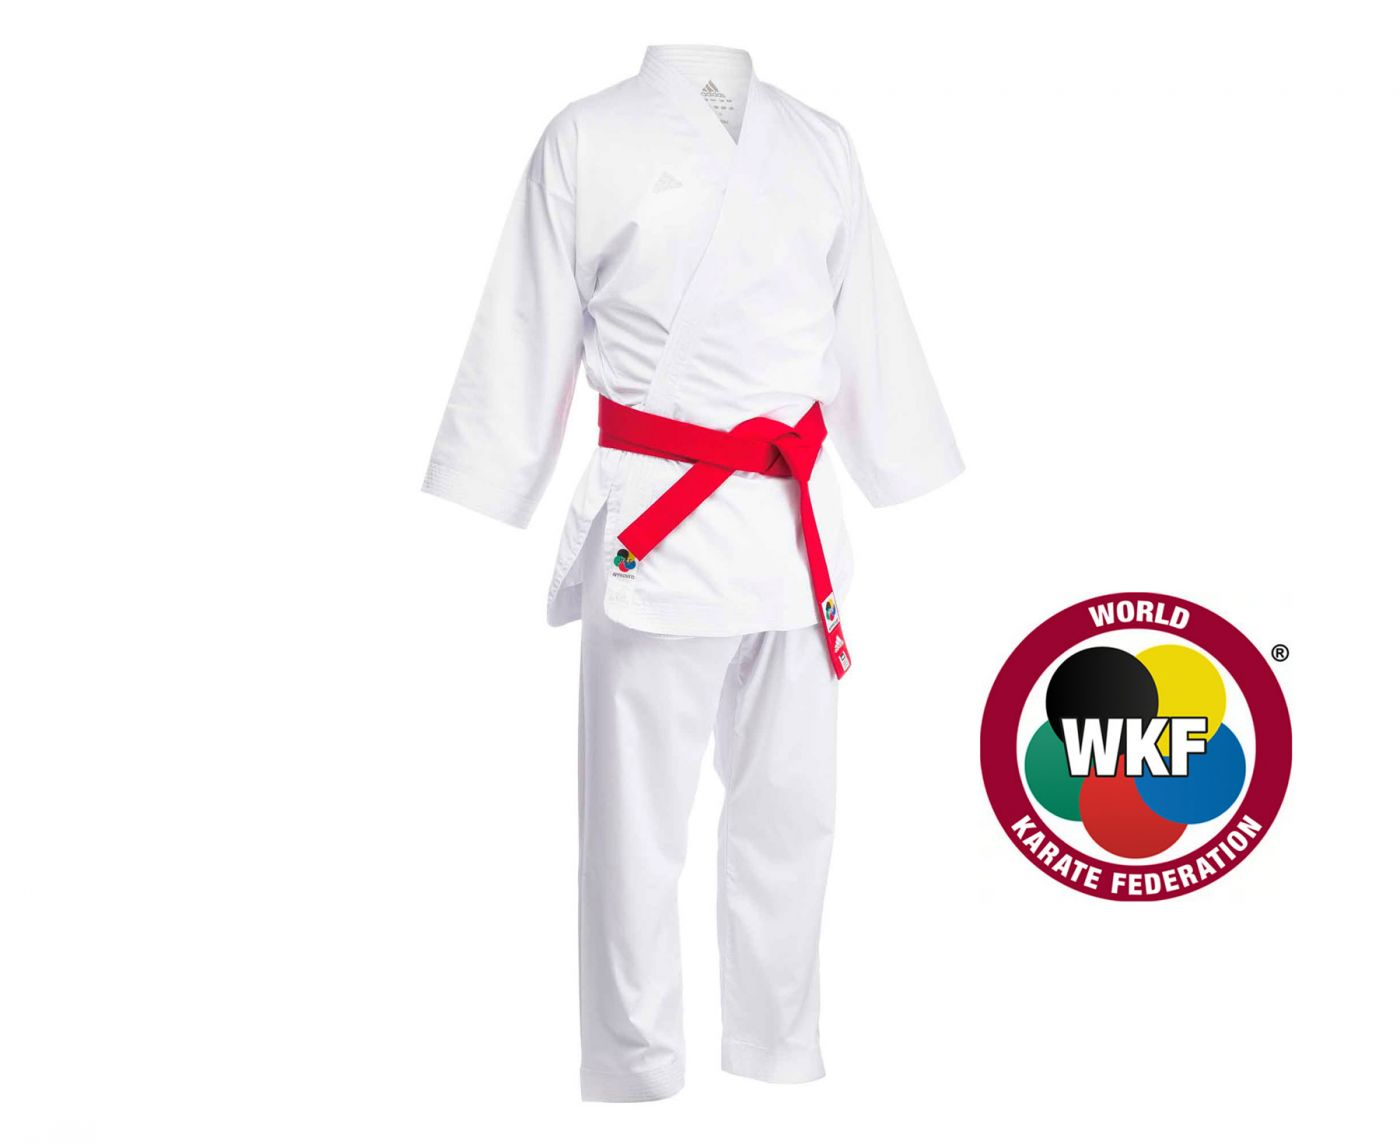 Кимоно для карате Adidas Adizero WKF белое, размер 170 см, артикул K0